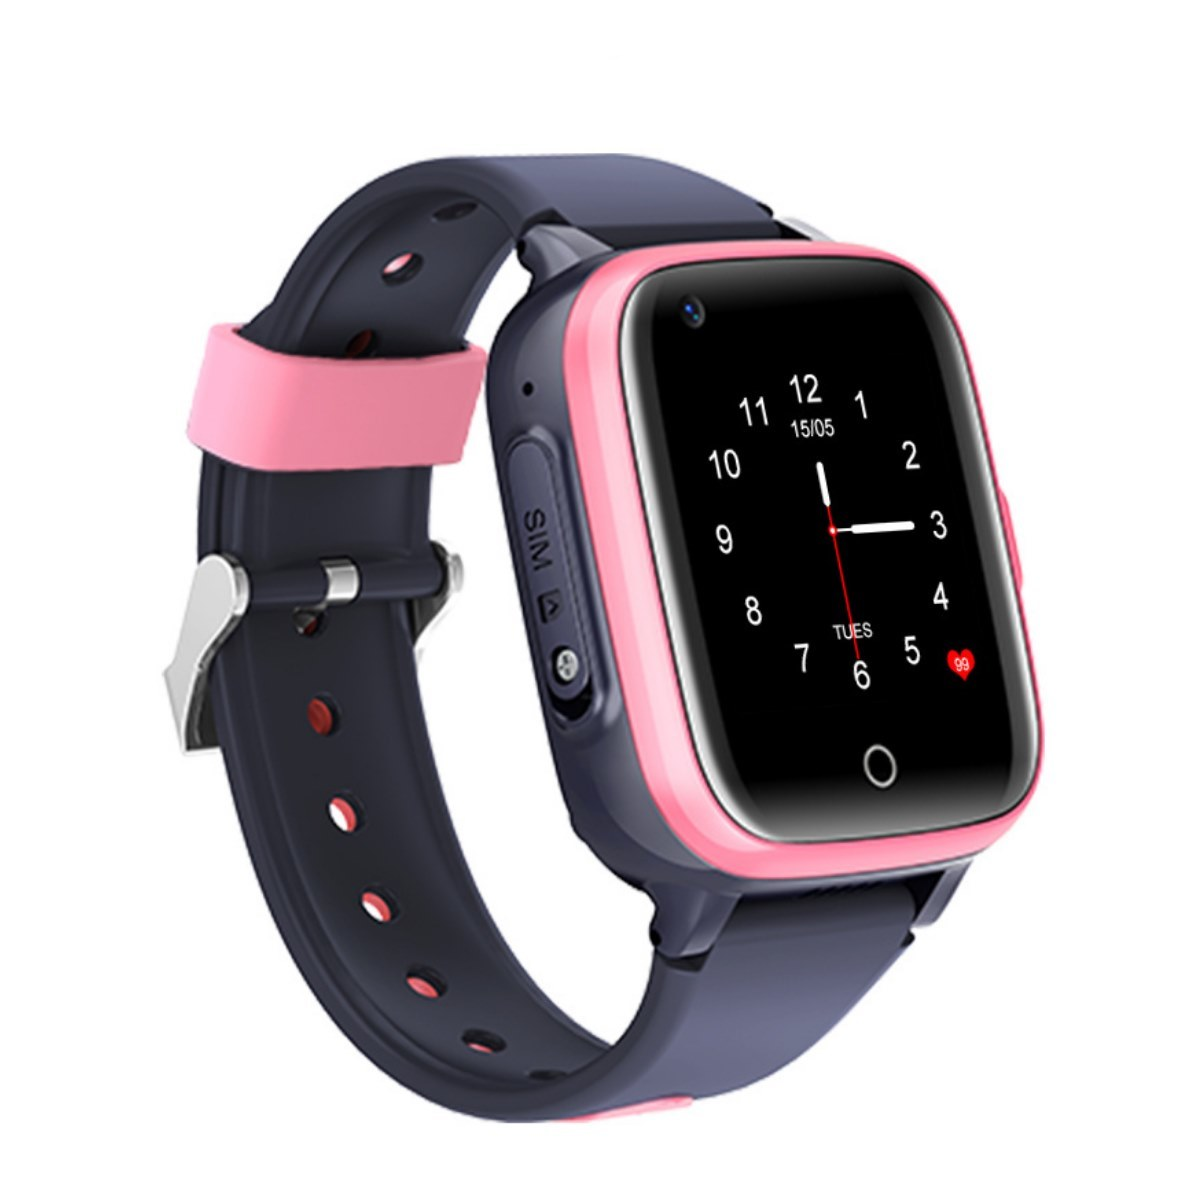 Каталог Часы с видеозвонком Smart Baby Watch Wonlex KT15 Смарт_часы_Wonlex_New_KT15__5_.jpg